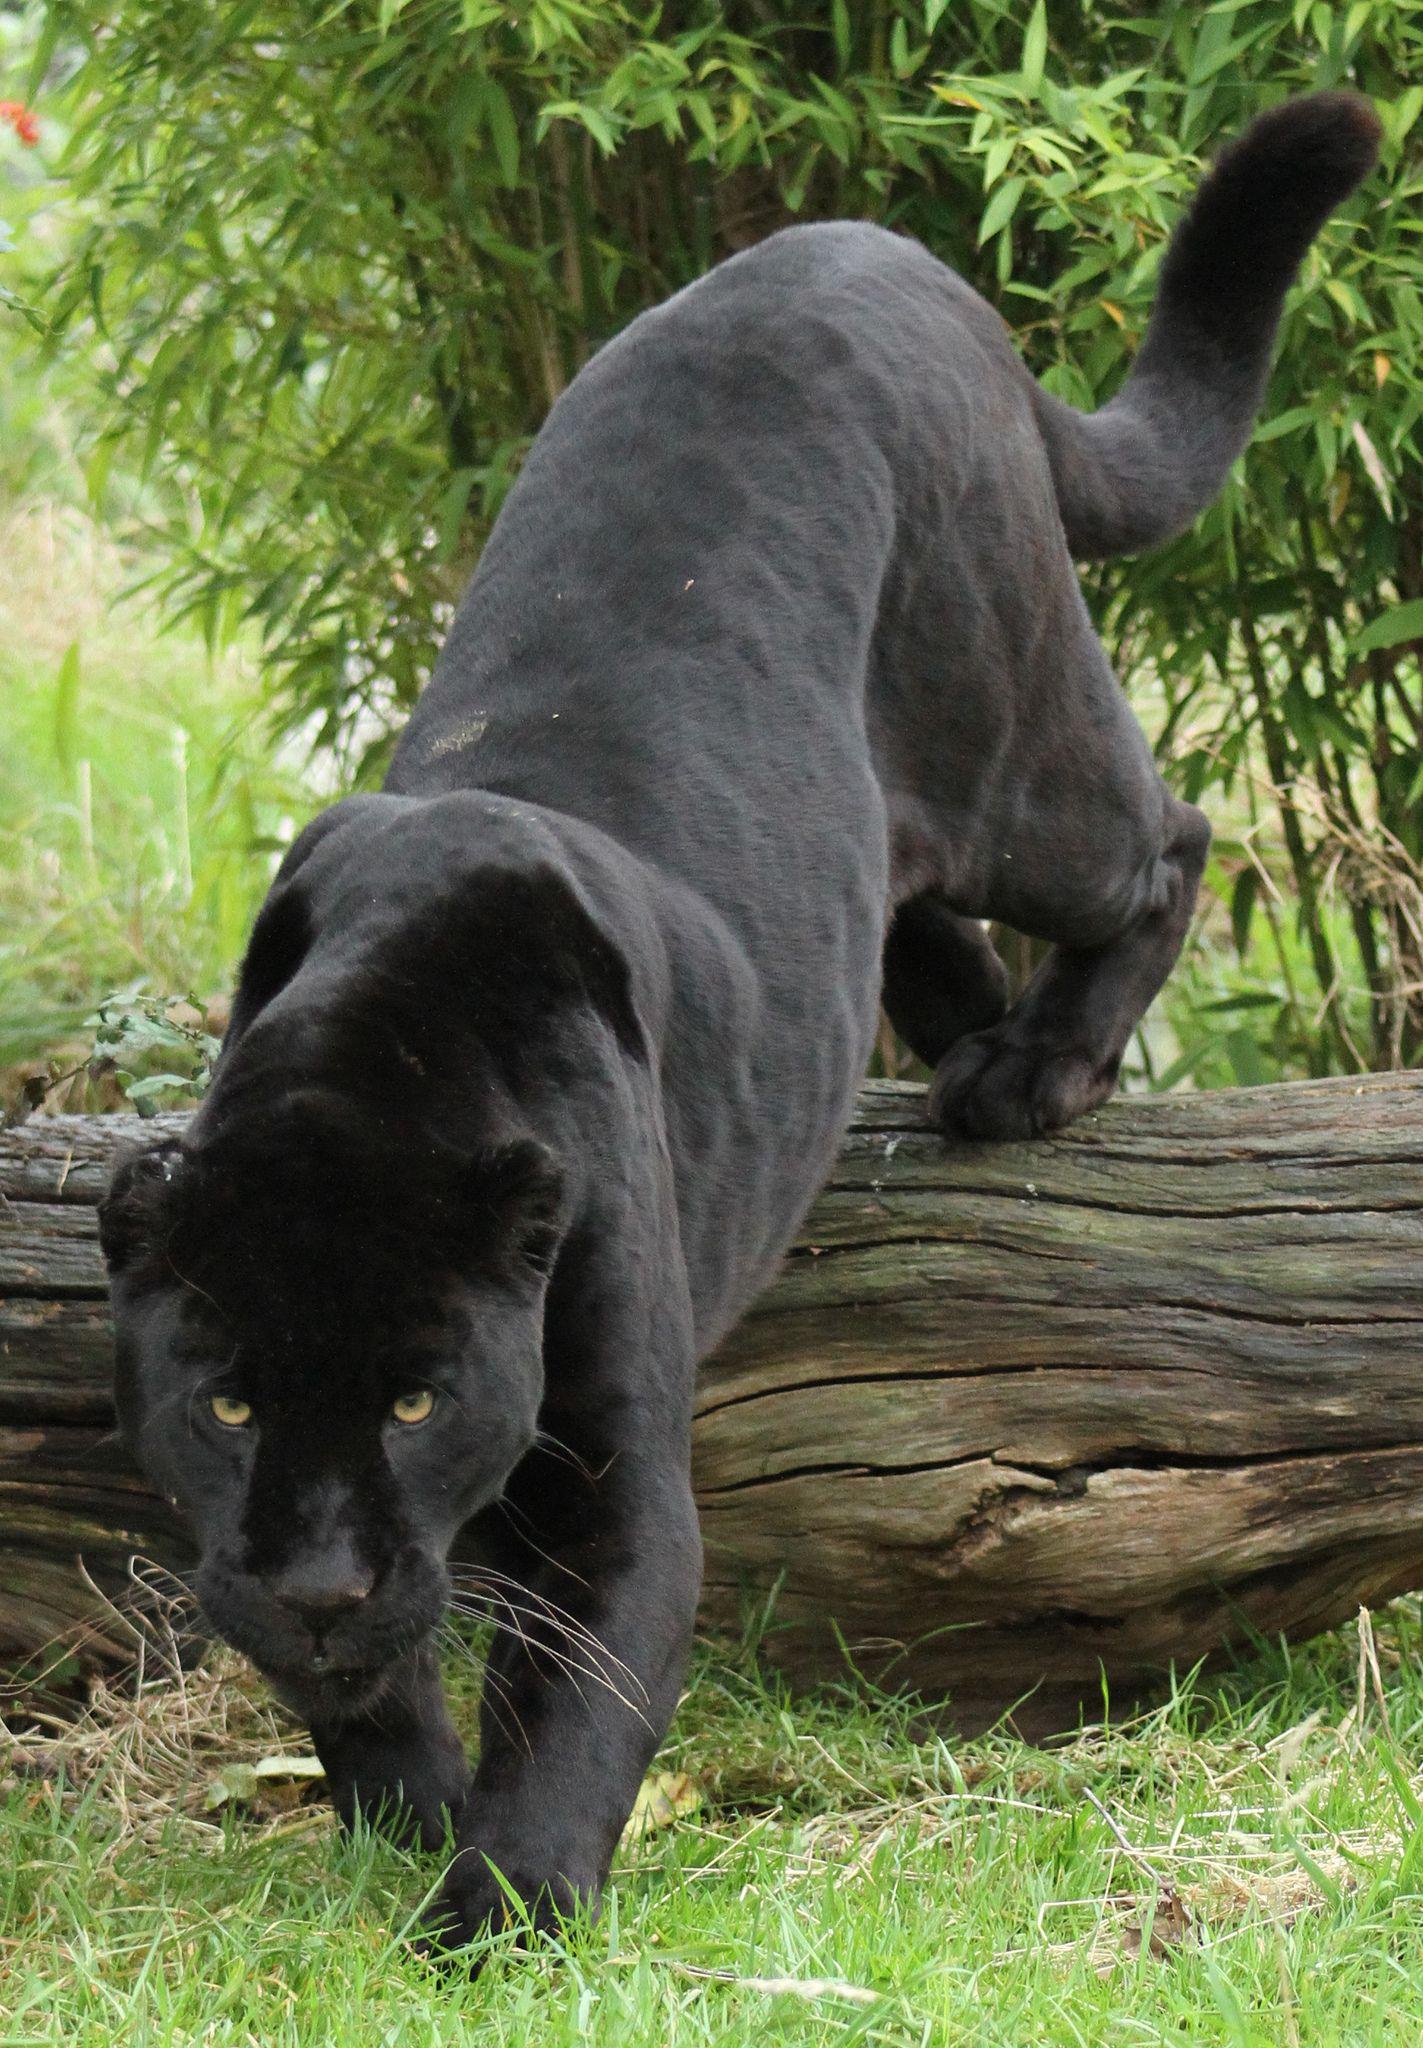 Black Jaguar | Animal Kingdom | Black jaguar, Animals ... - photo#25